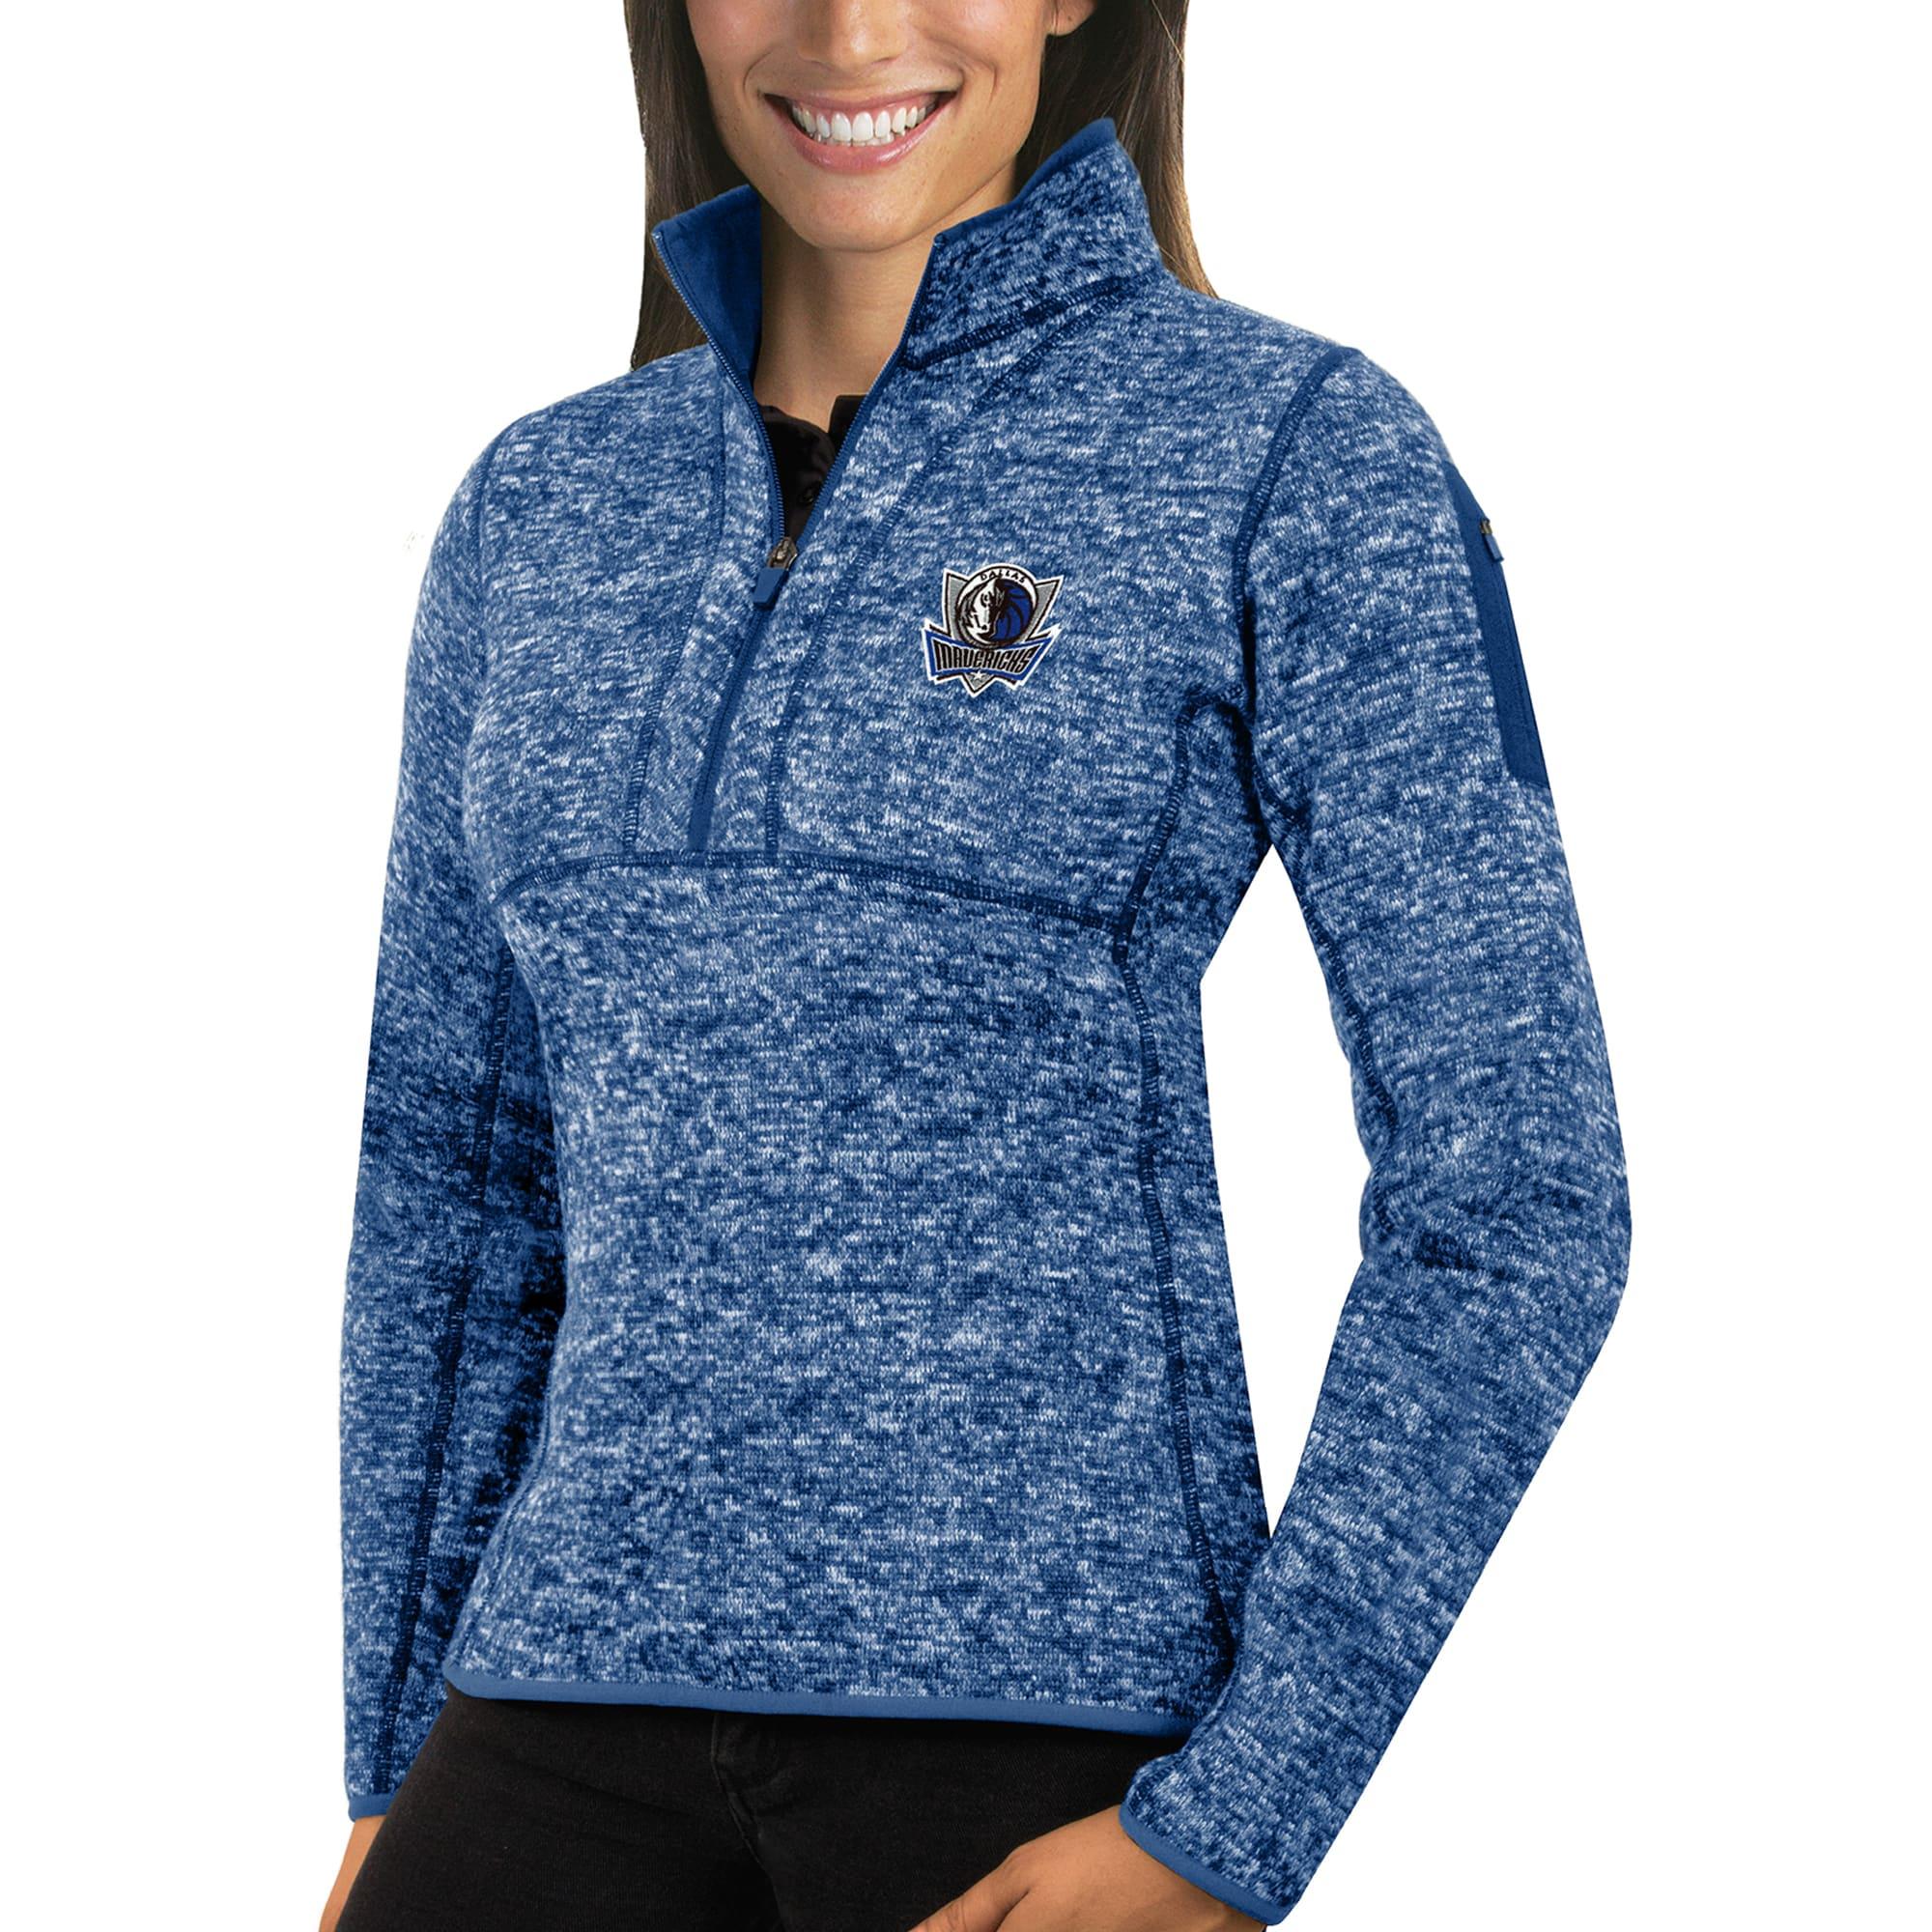 Dallas Mavericks Antigua Women's Fortune Half-Zip Pullover Jacket - Heather Royal